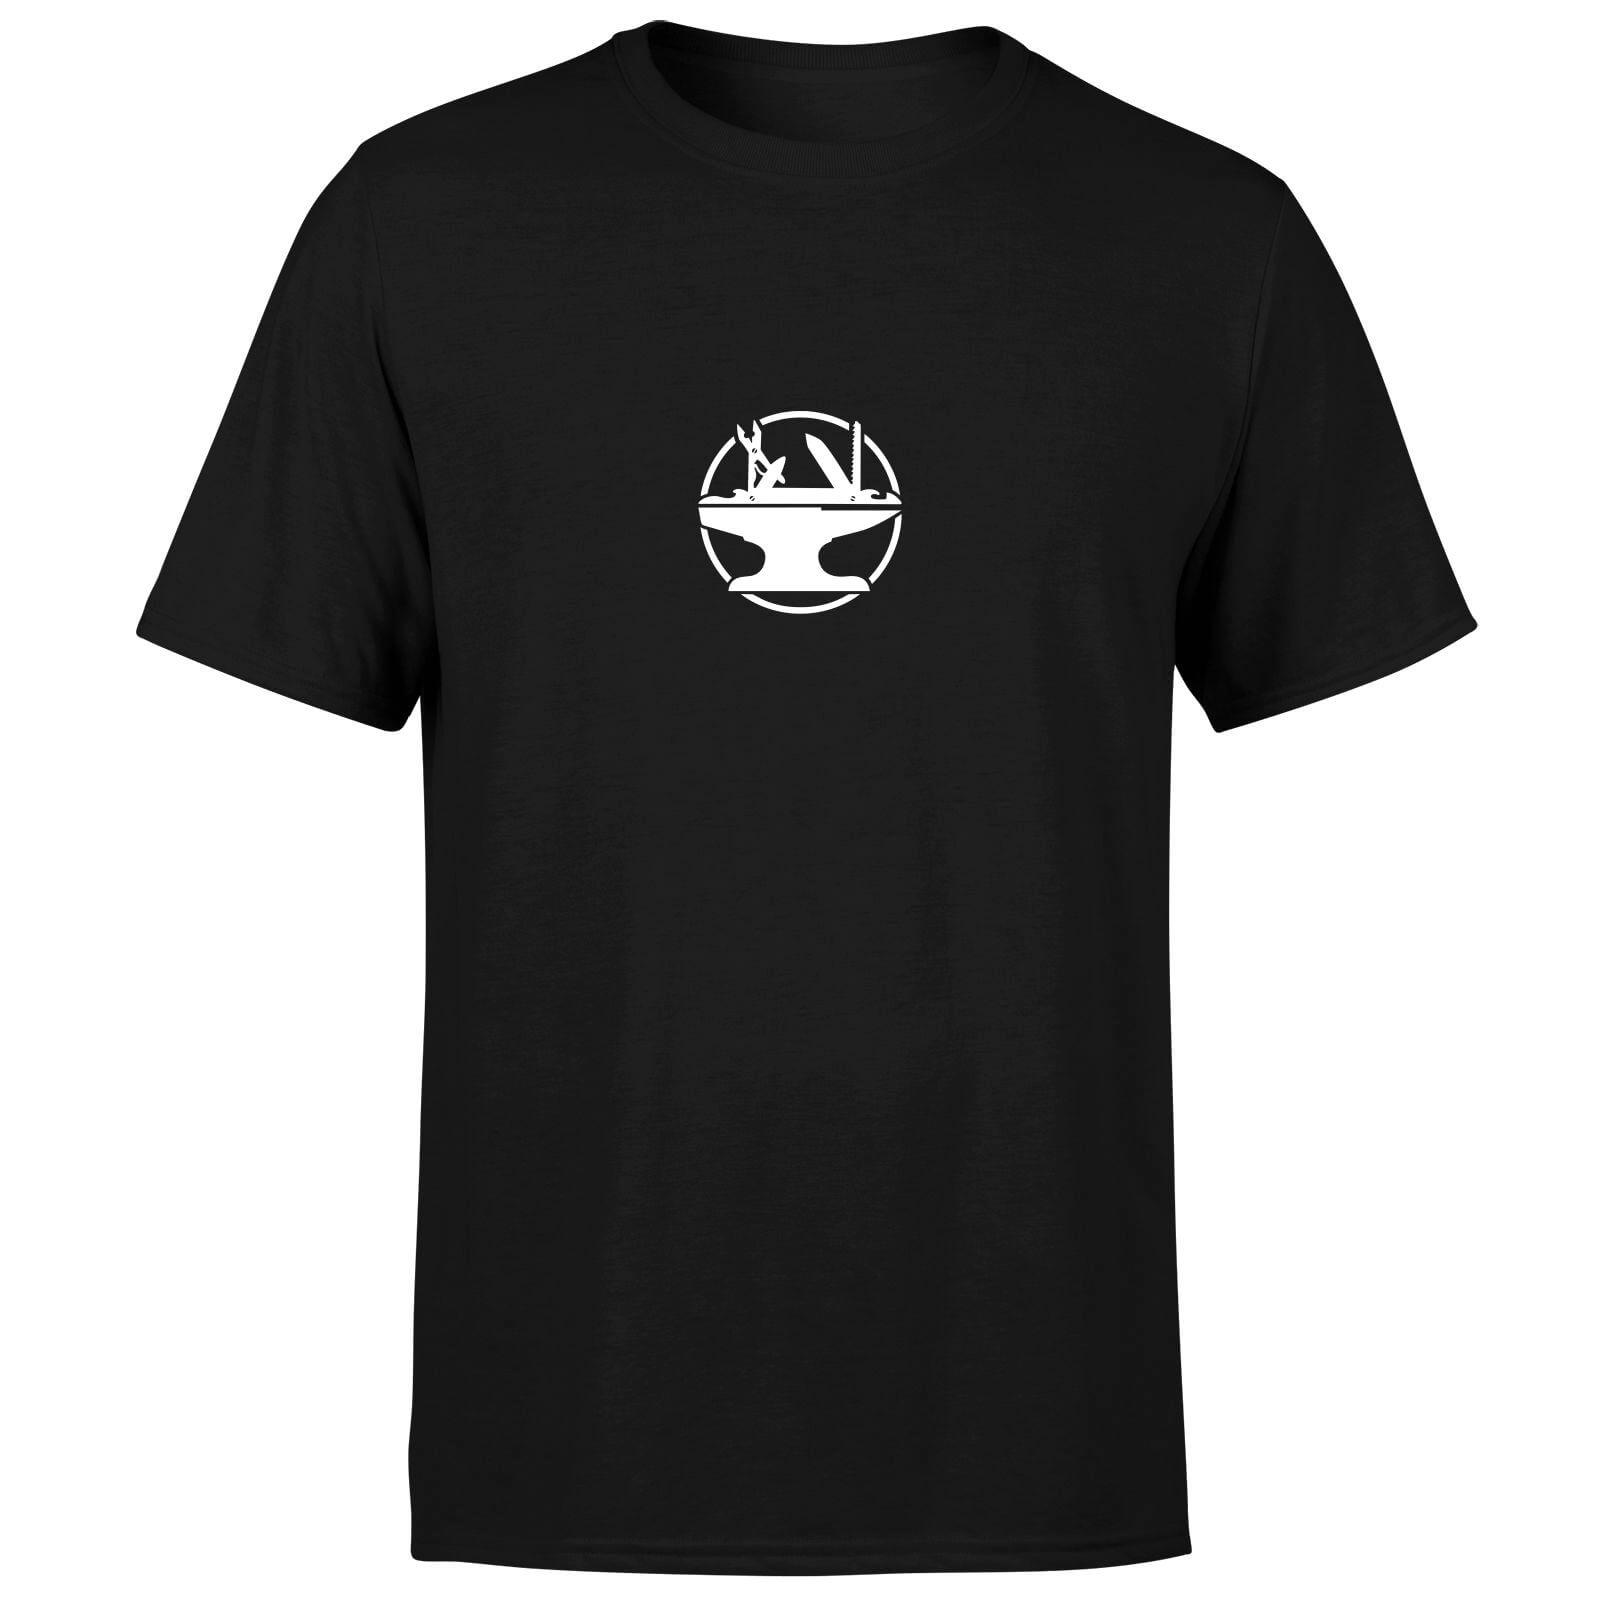 Hacksmith Logo T-Shirt - Black - XS - Black